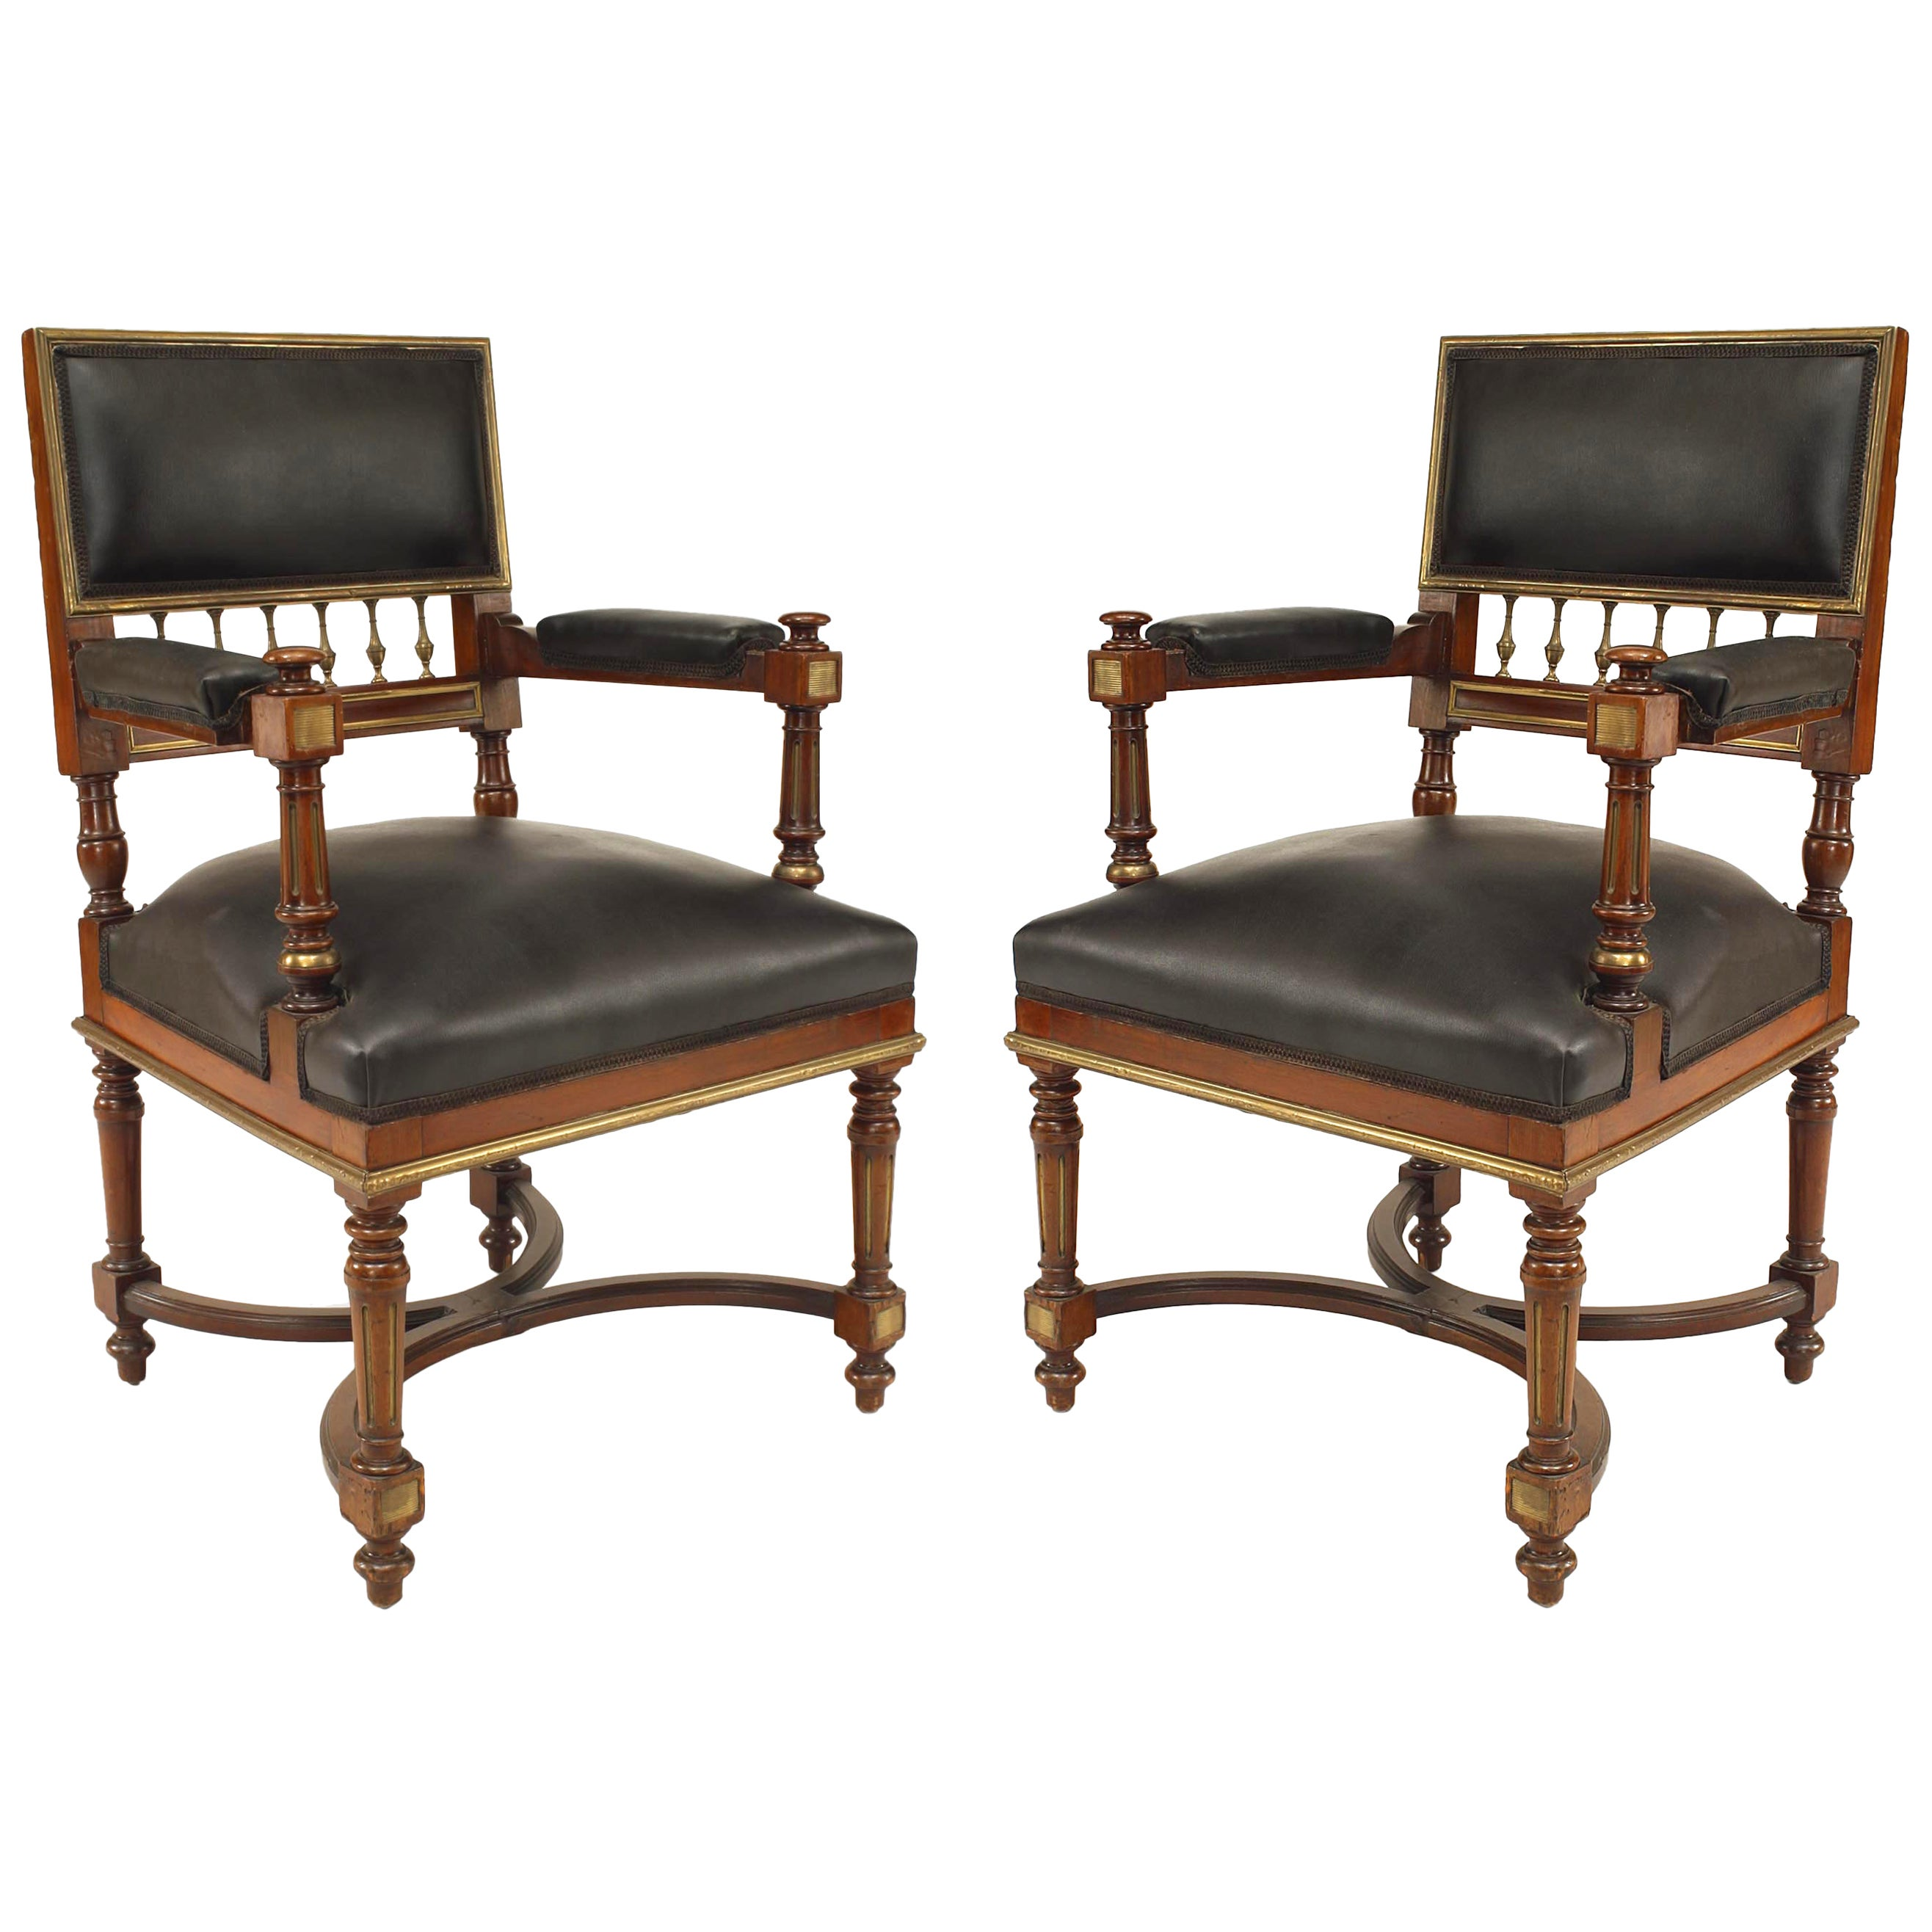 French Louis XVI Style '19th Century' Mahogany Armchairs